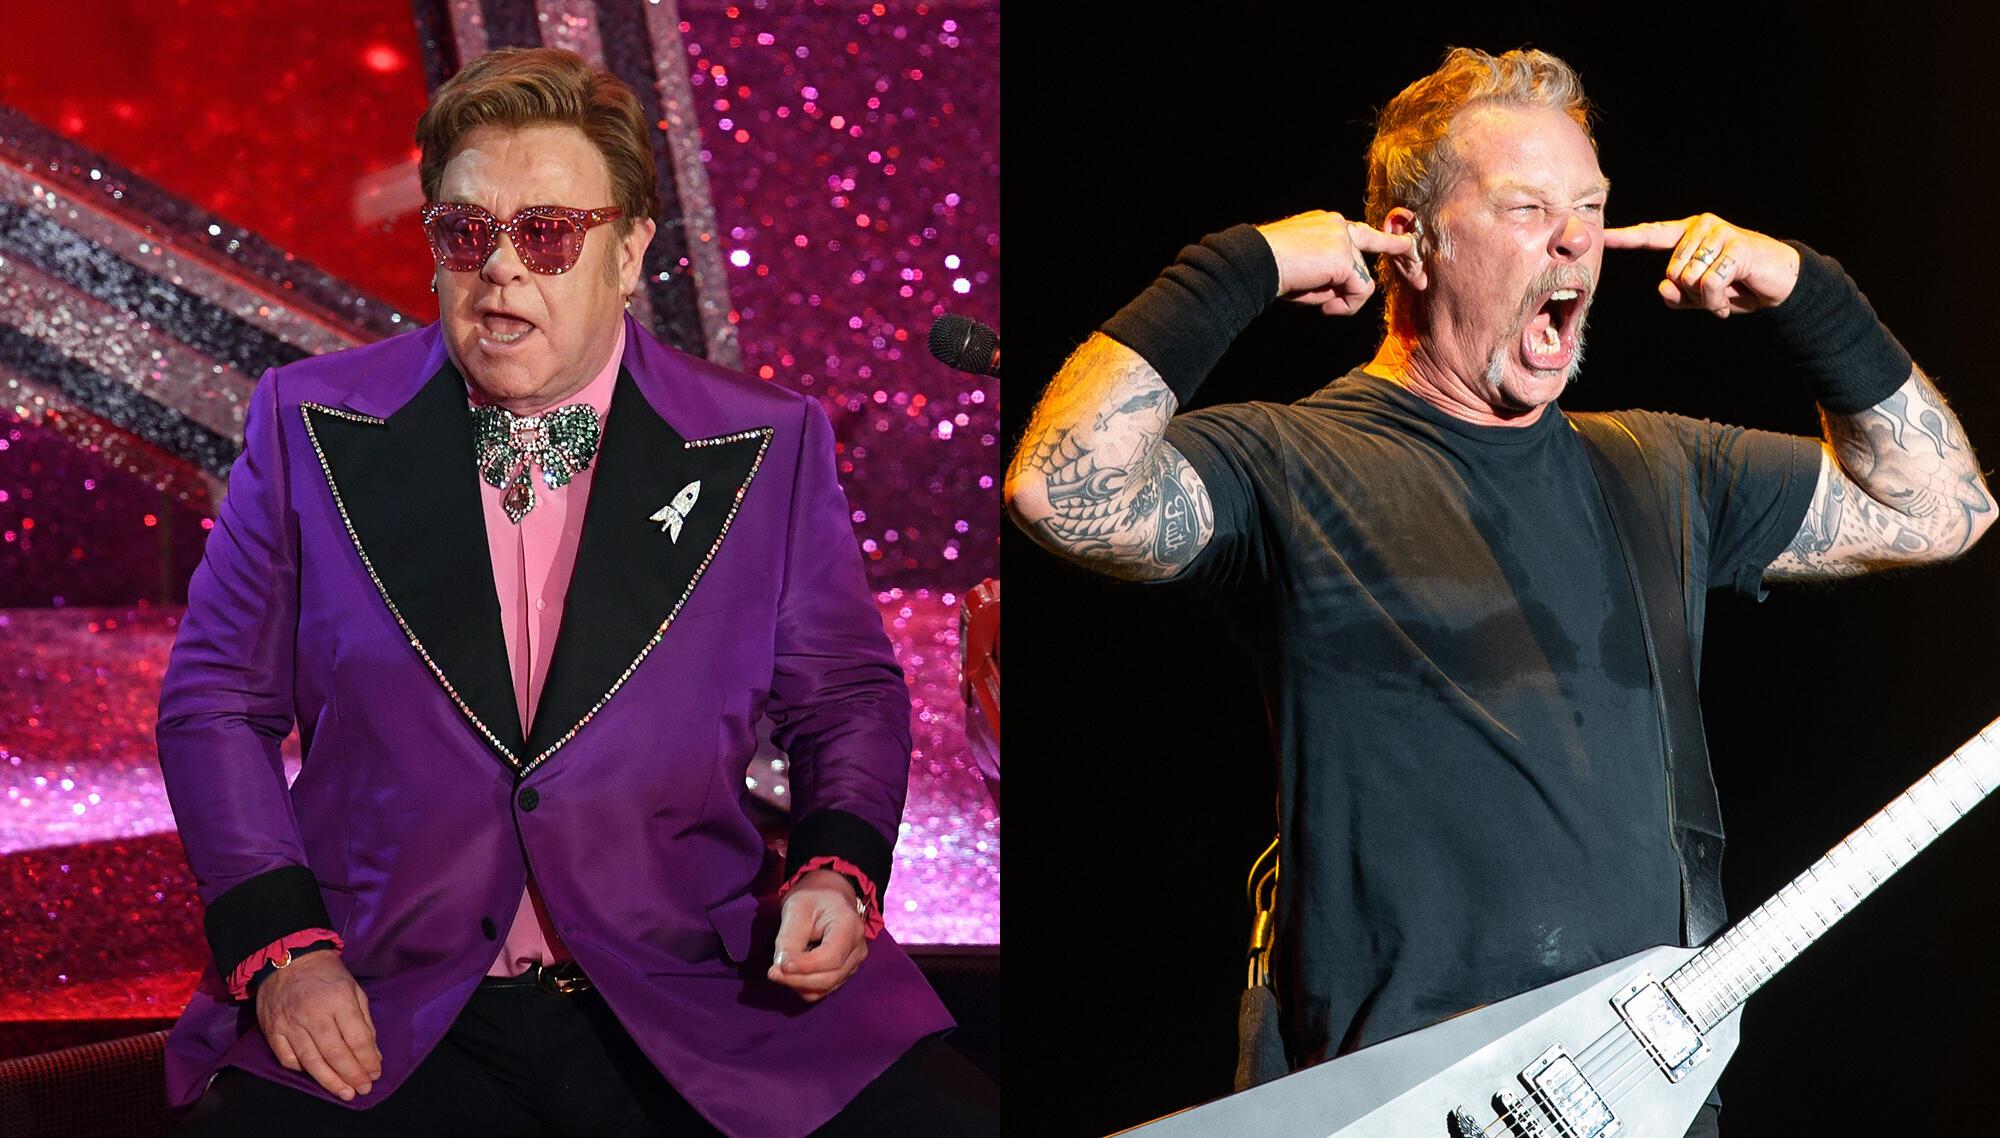 Elton John Says He Recorded With Metallica During Quarantine